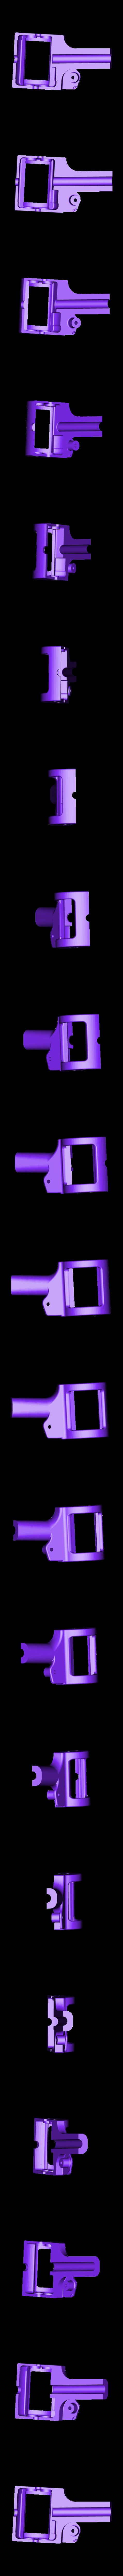 arm front4 (1pcs).STL Download STL file Folding Quadcopter 450 Frame • 3D print object, AleksandrDolzhenko